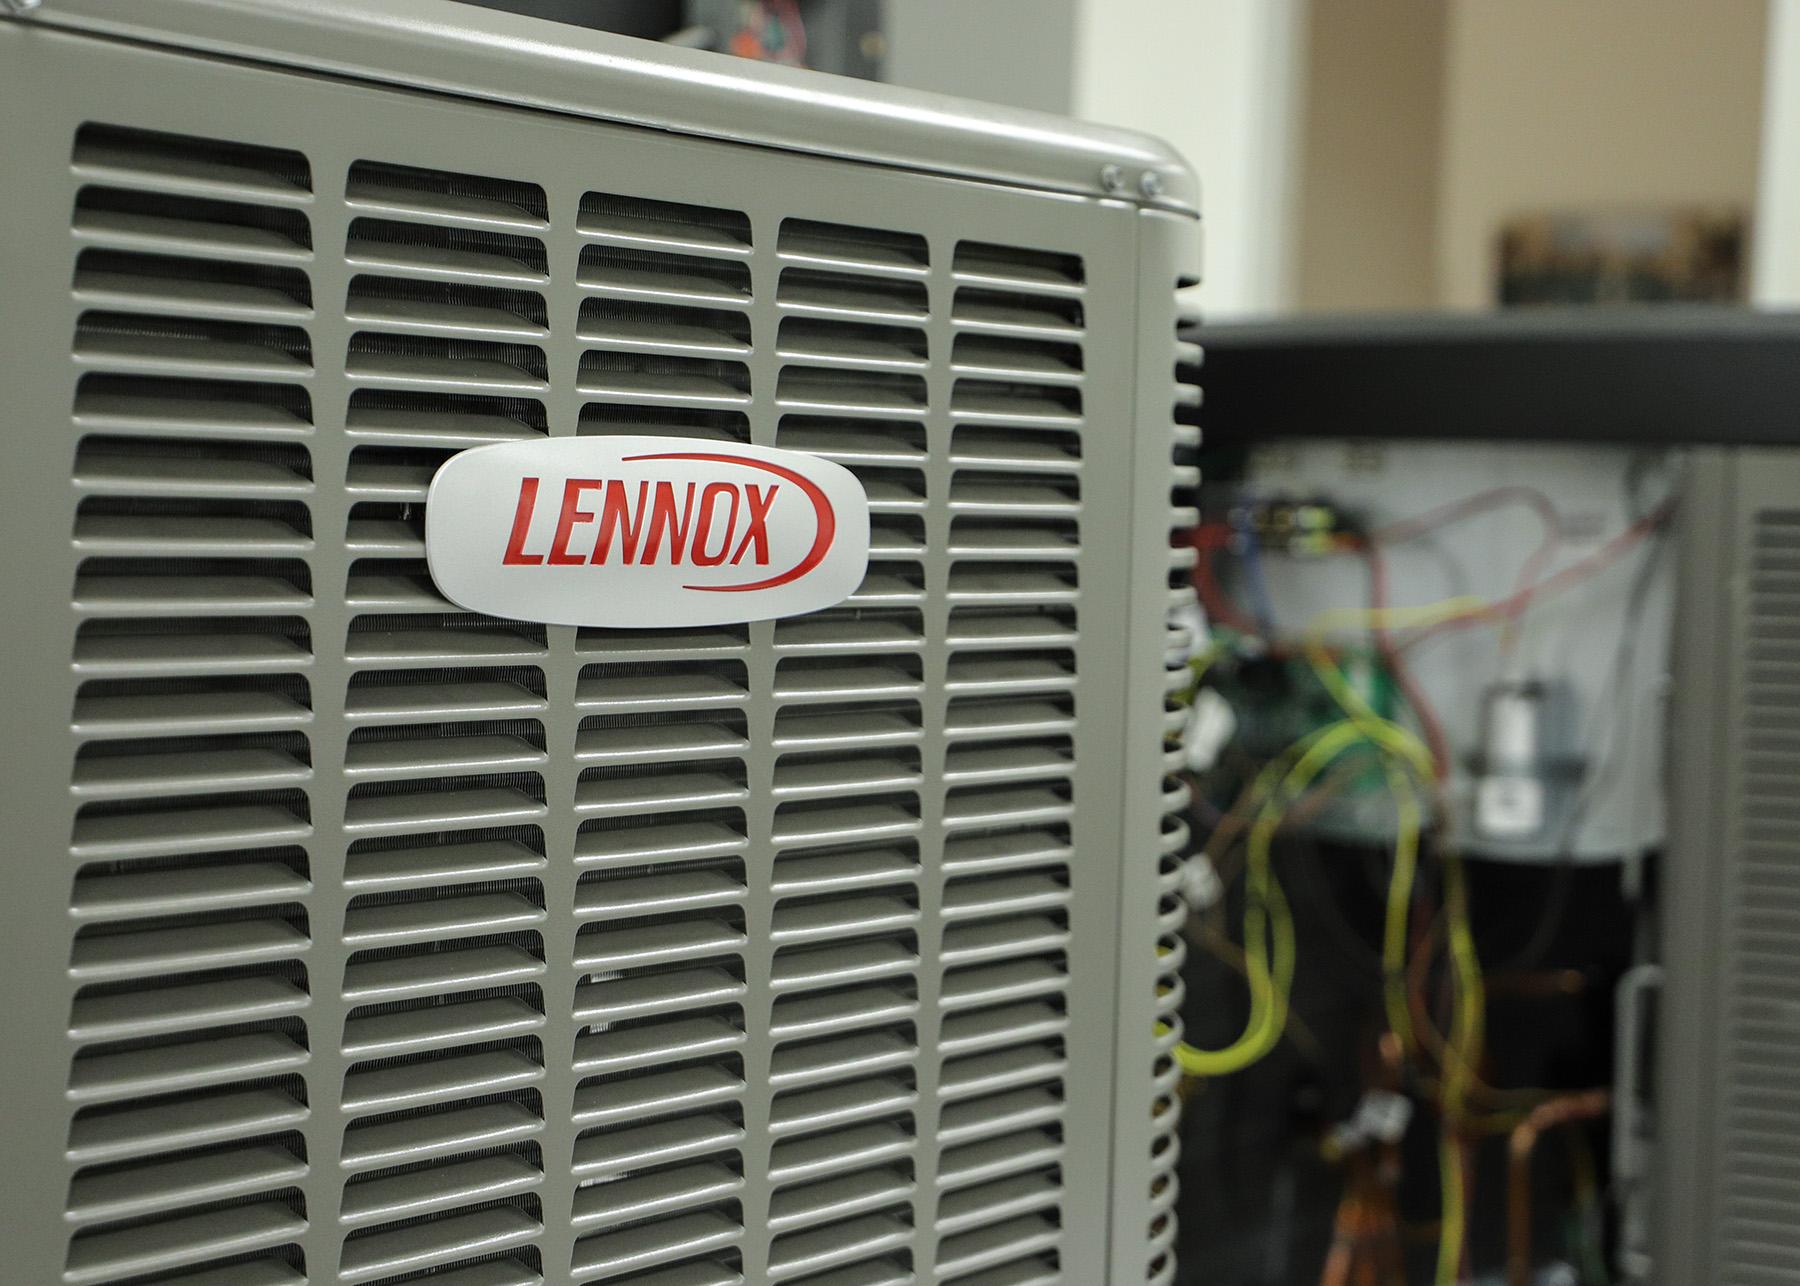 lennox product